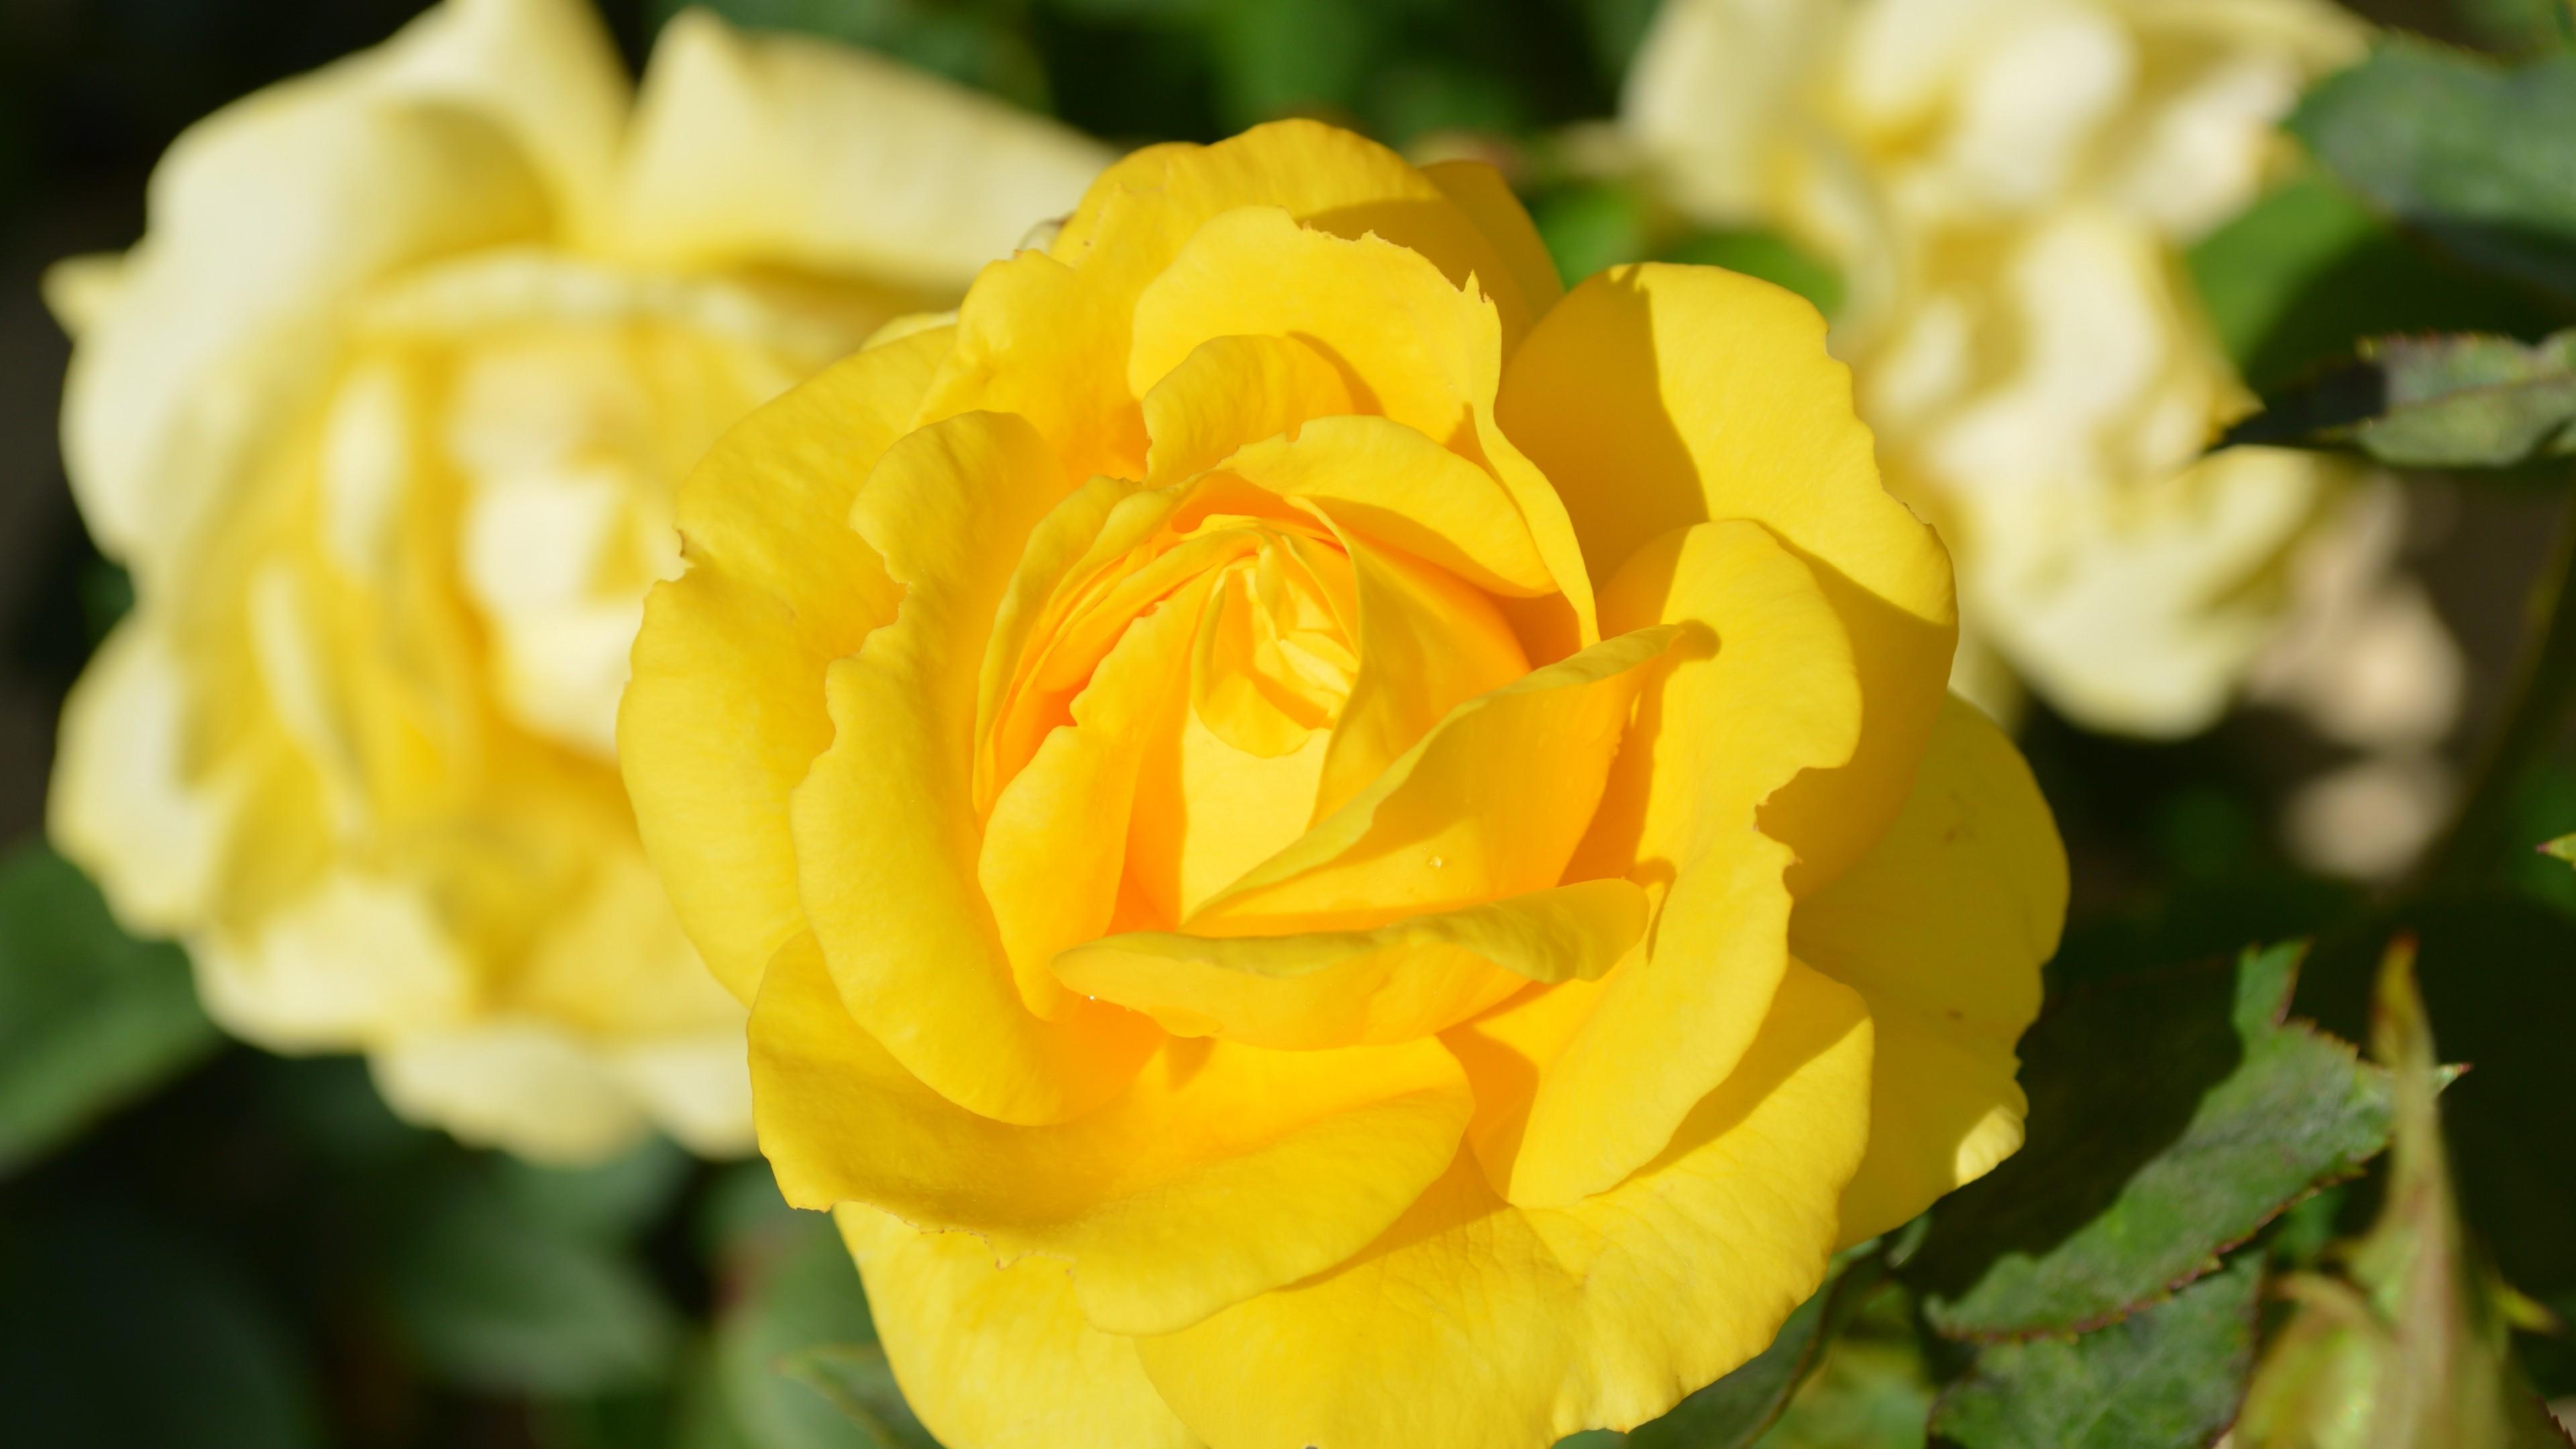 rose bud 4k 1606508463 - Rose Bud 4k - Rose Bud 4k wallpapers